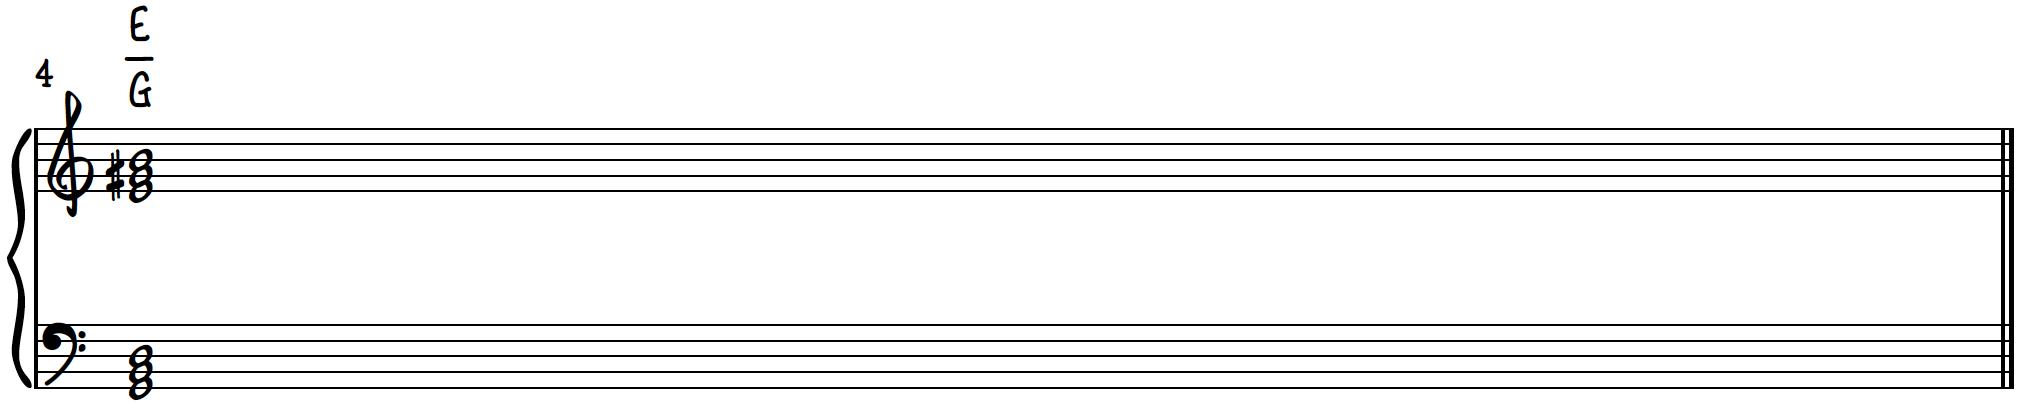 Dissonant Chord 2 - E major over G major poly chord on piano